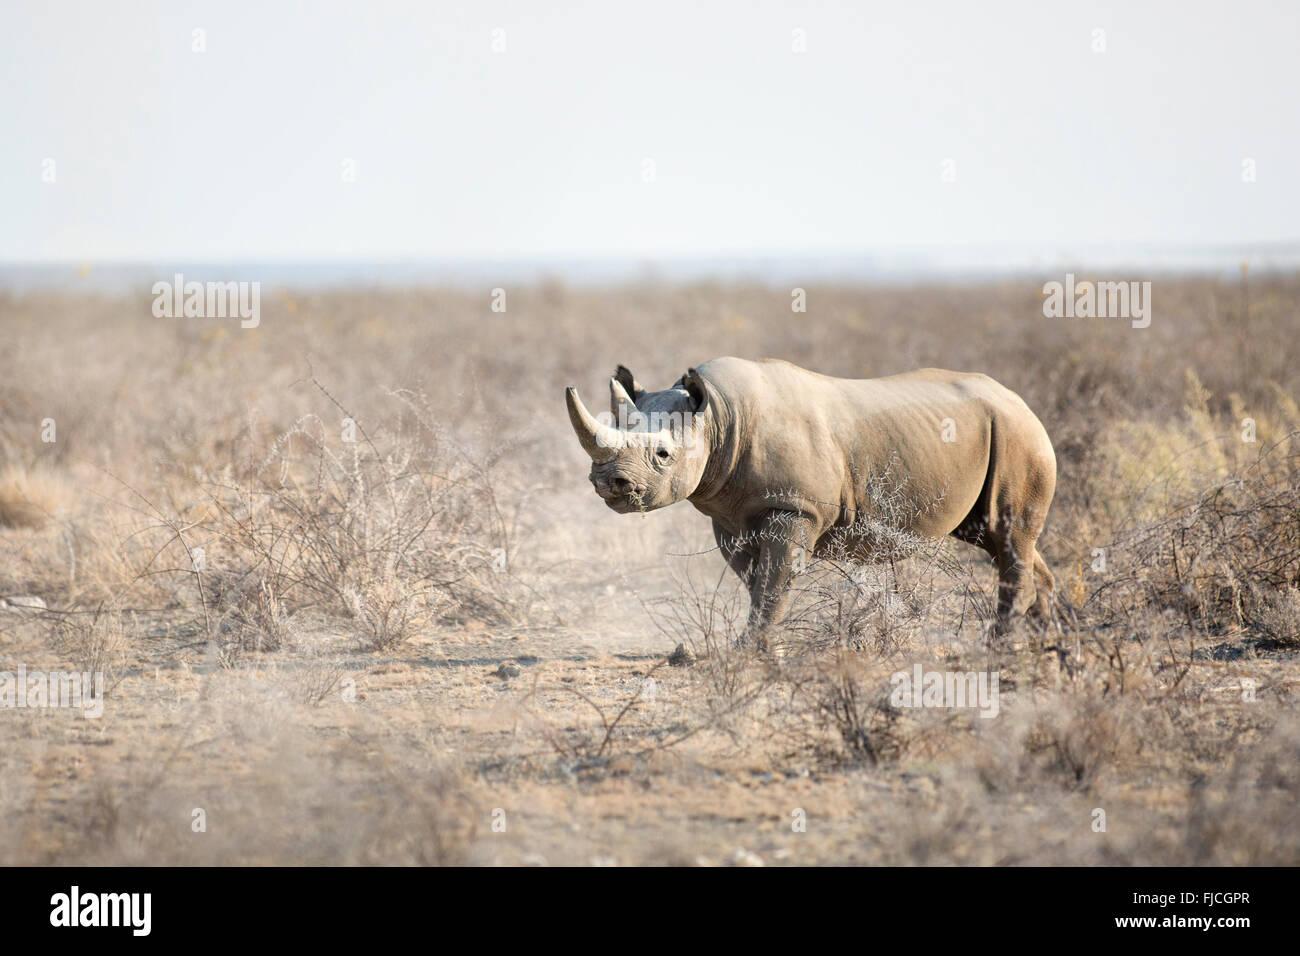 A Black Rhino - Stock Image